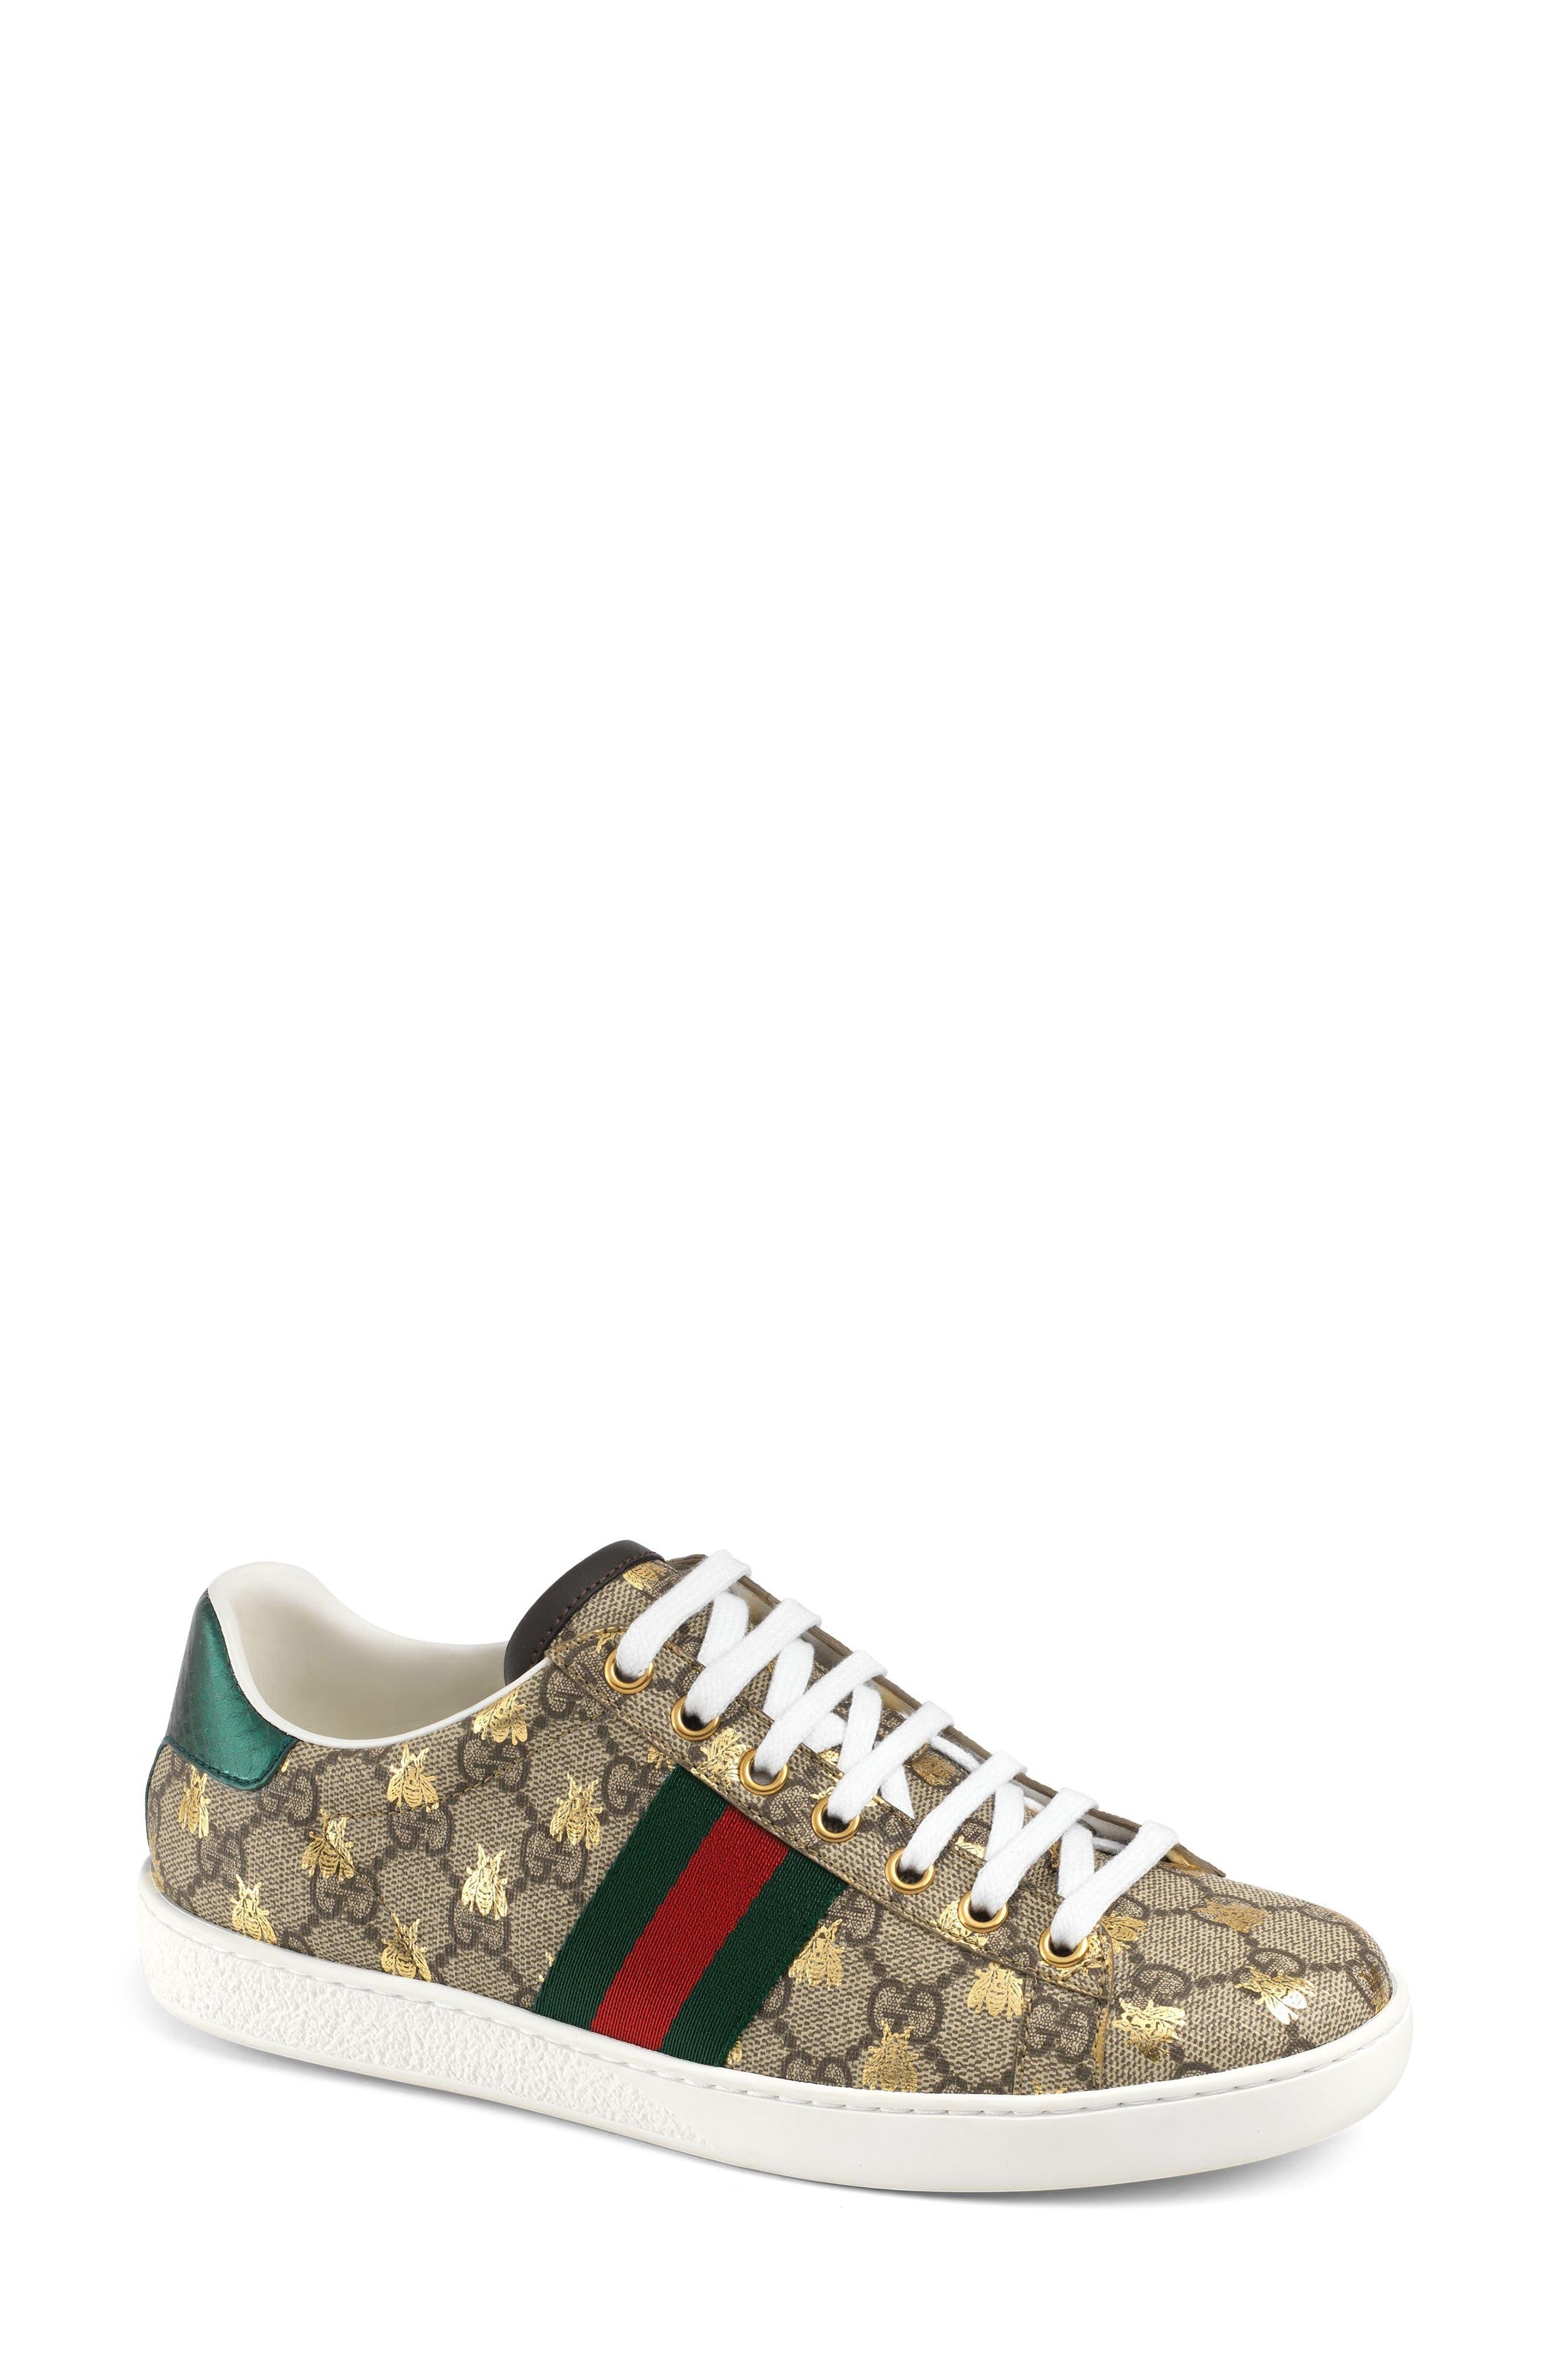 Gucci New Ace Monogram Bee Sneaker - Beige